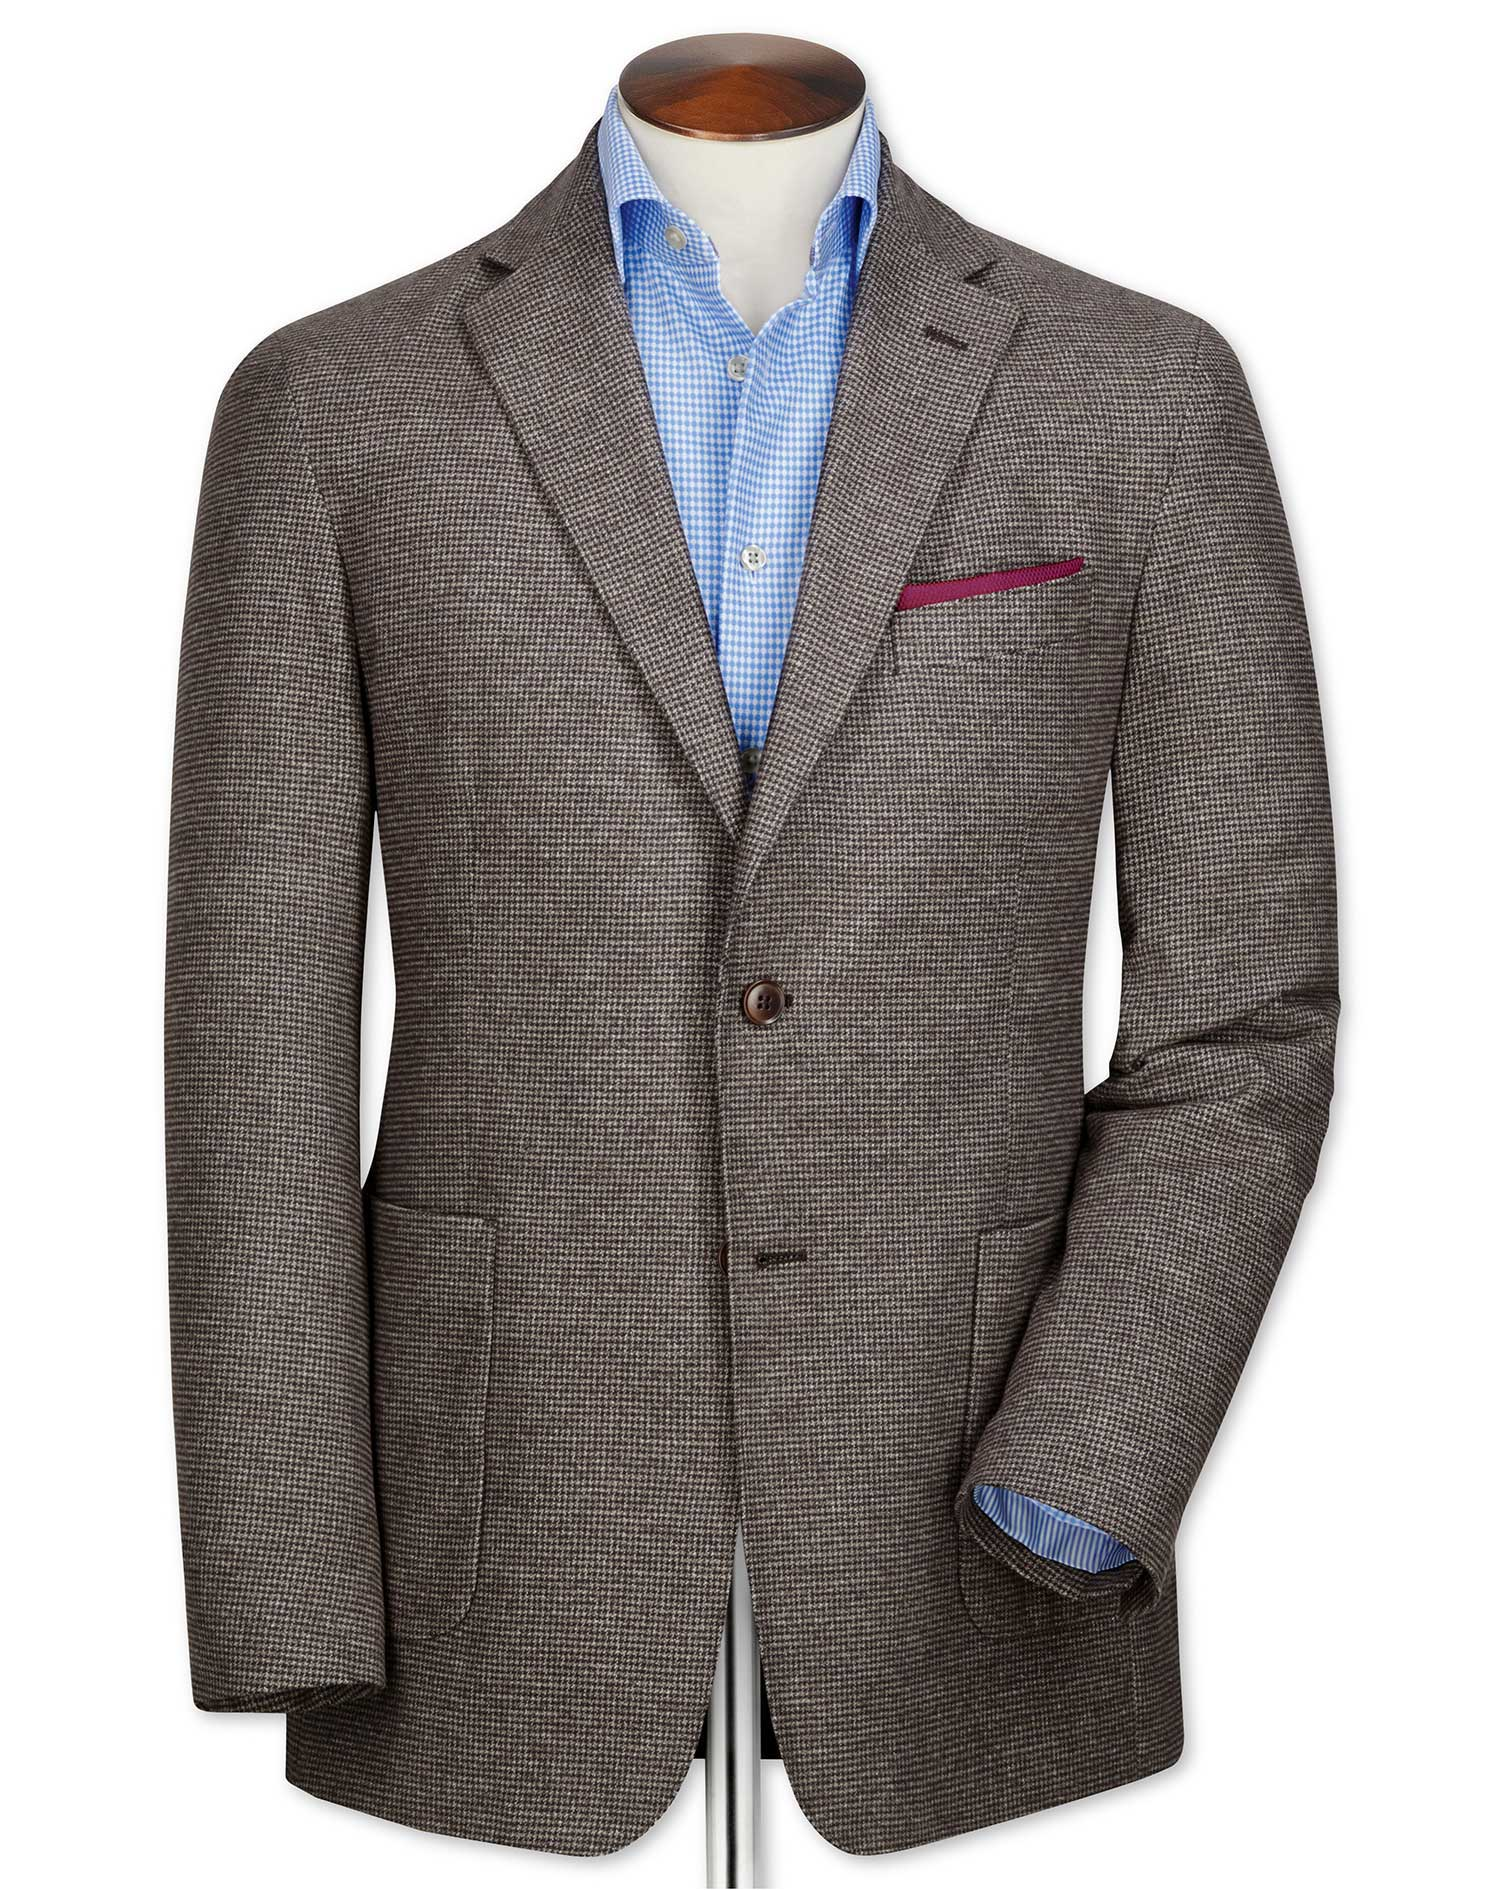 Slim Fit Brown Semi-Plain Cotton Flannel Cotton Jacket Size 46 Long by Charles Tyrwhitt